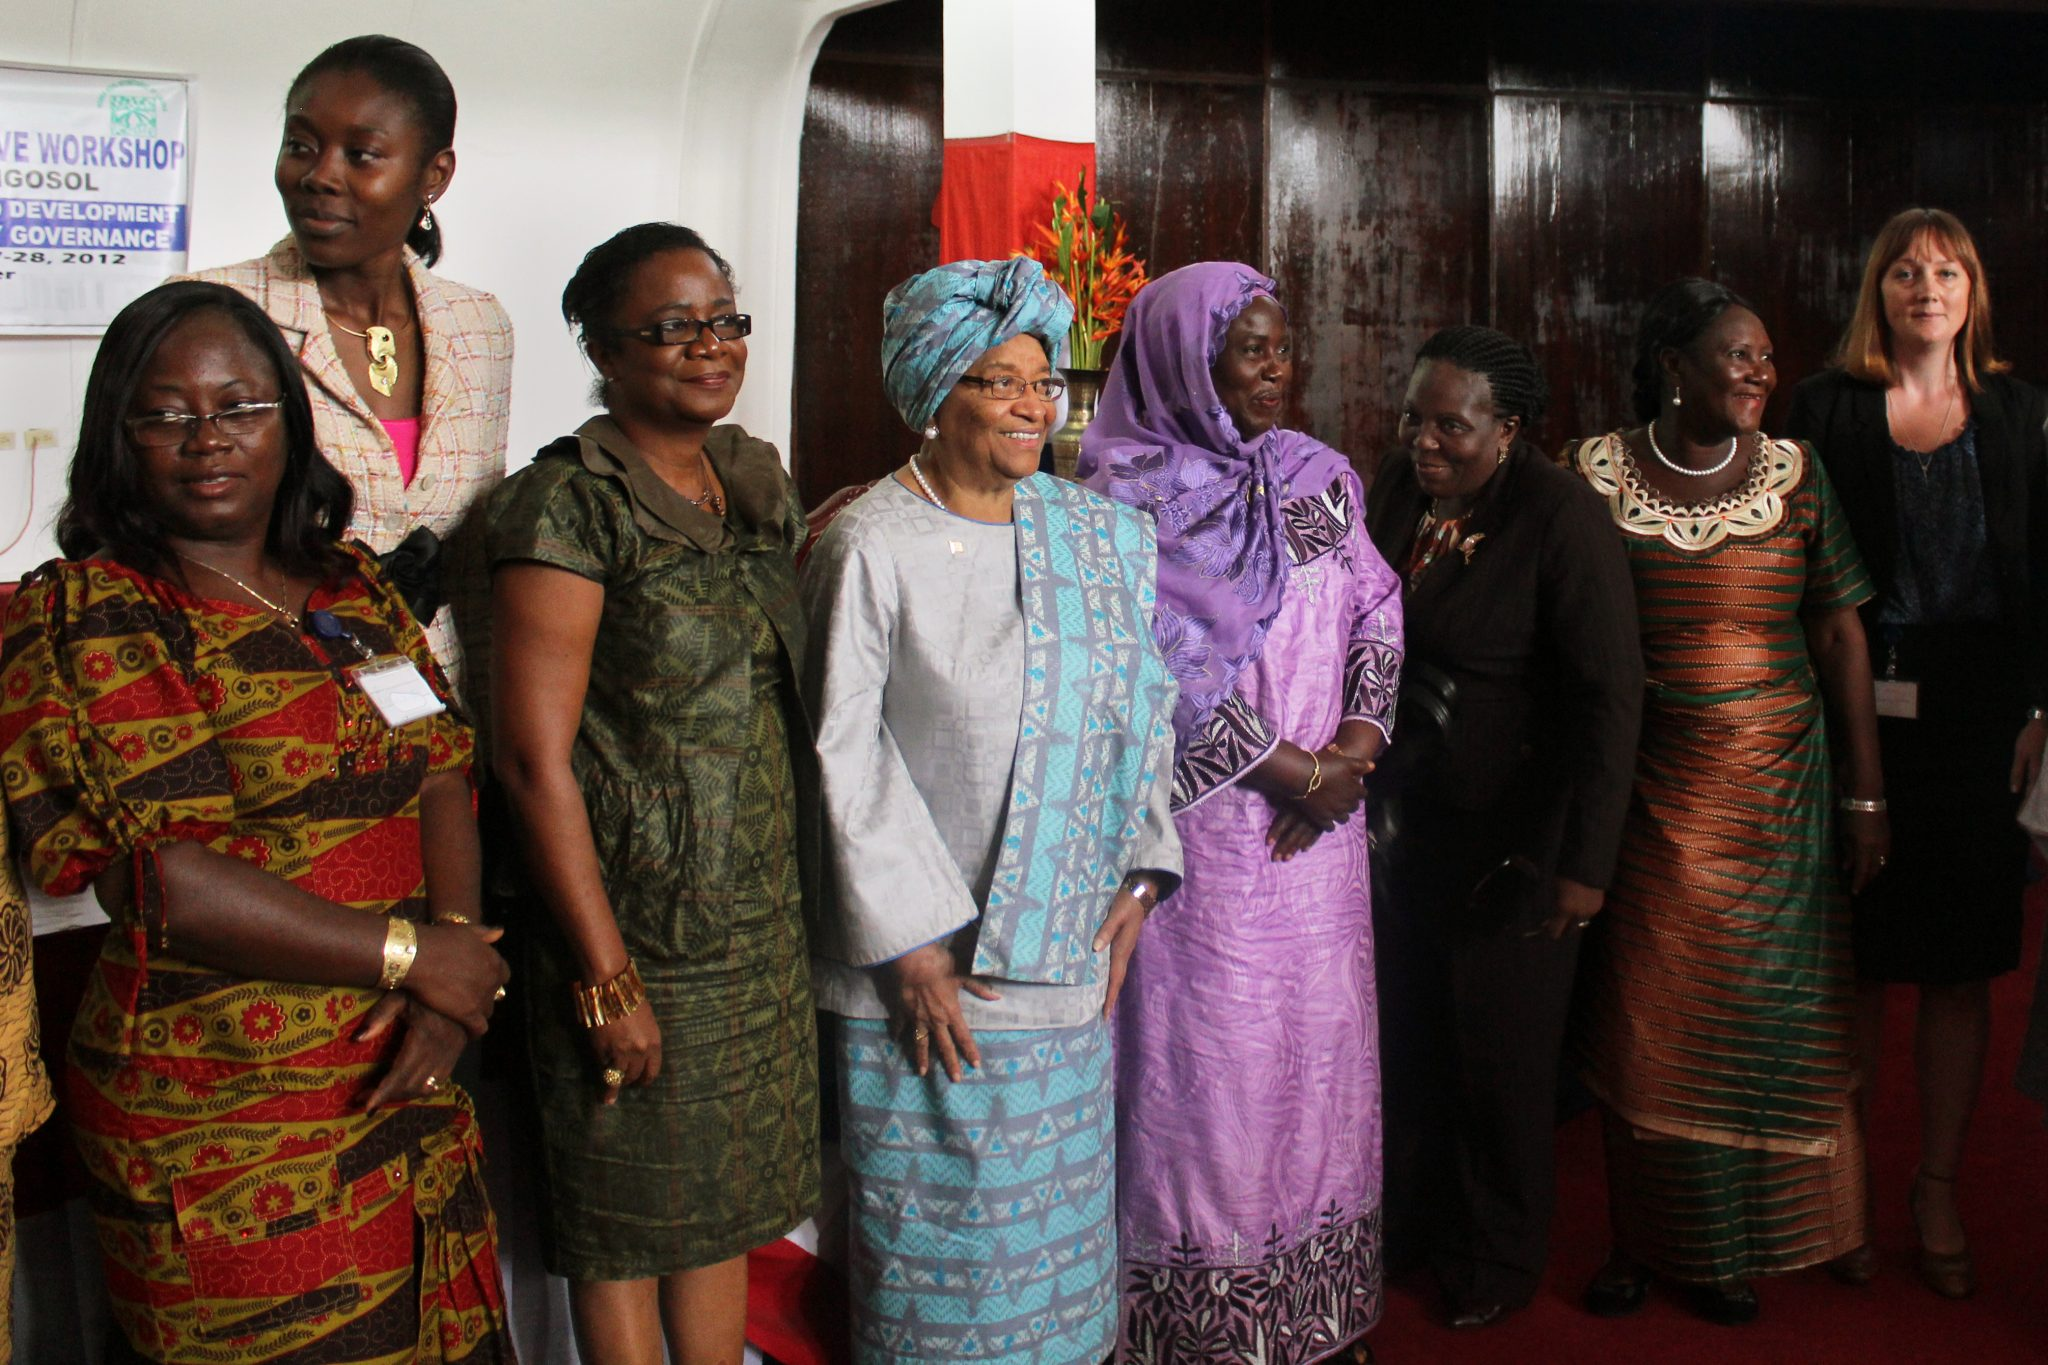 The Liberian women's movement gathered in Monrovia to discuss women's political participation. President Ellen Johnson Sirleaf (centre, in blue) attended. Photo: Christina Hagner / Kvinna till Kvinna